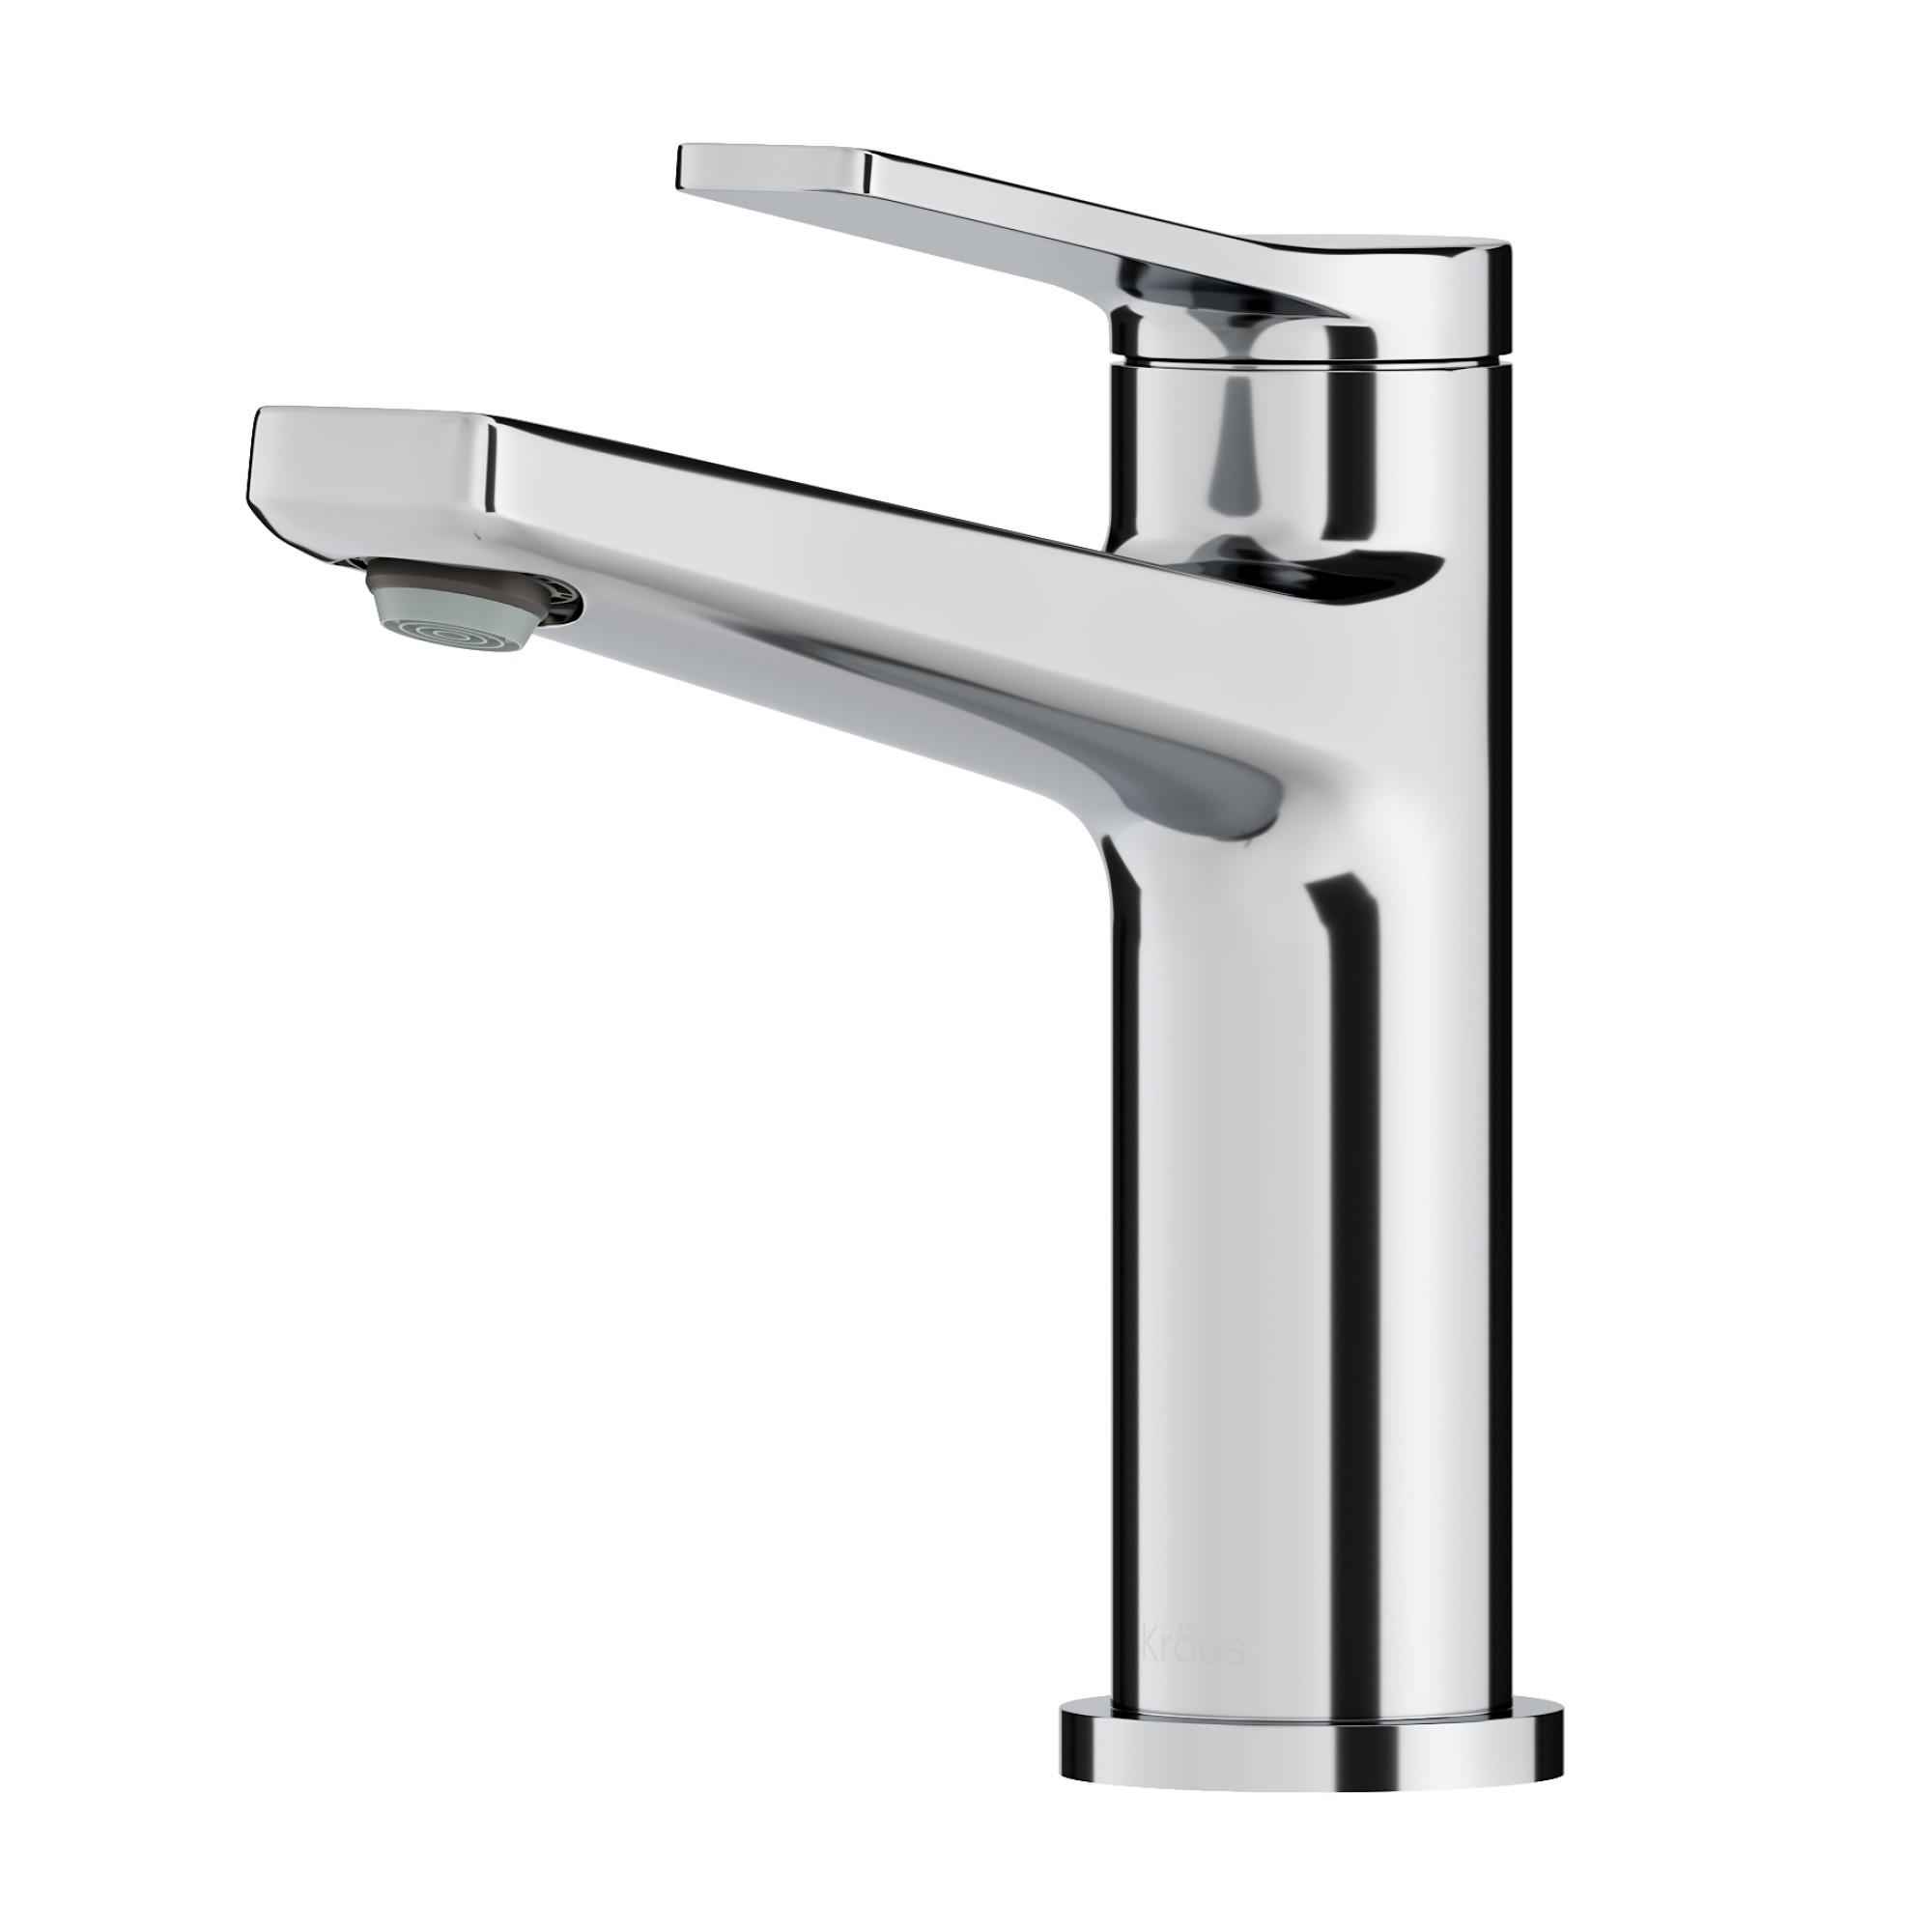 kraus kbf 1401 indy single handle bathroom faucet